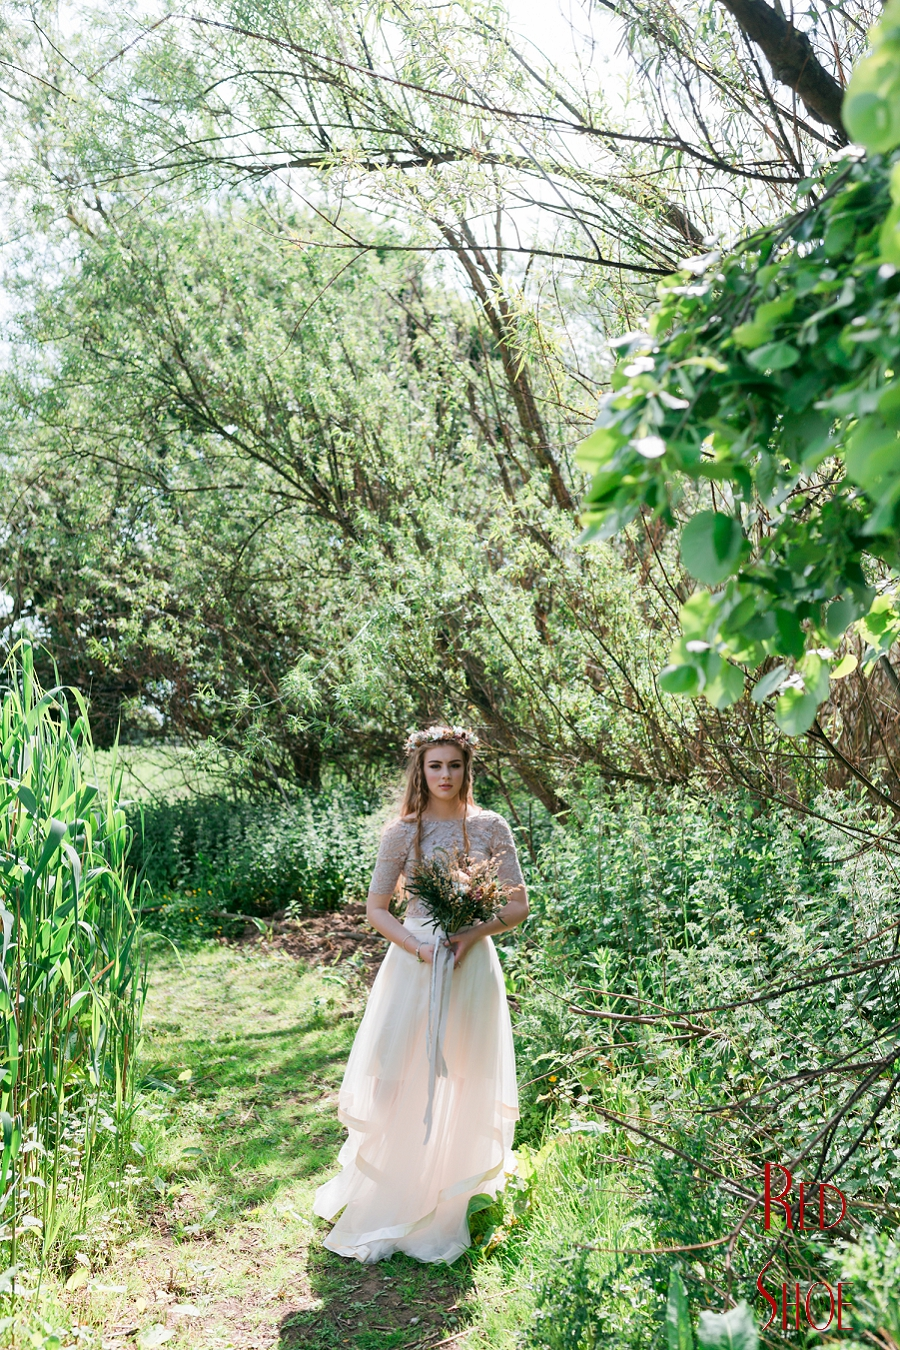 Boho bride, Glam Boho bride, Wedding inspiration, Styled wedding photo shoot, wedding ideas, wedding flower ideas, wedding photography, dried wedding flowers, boho bride makeup ideas_0105.jpg